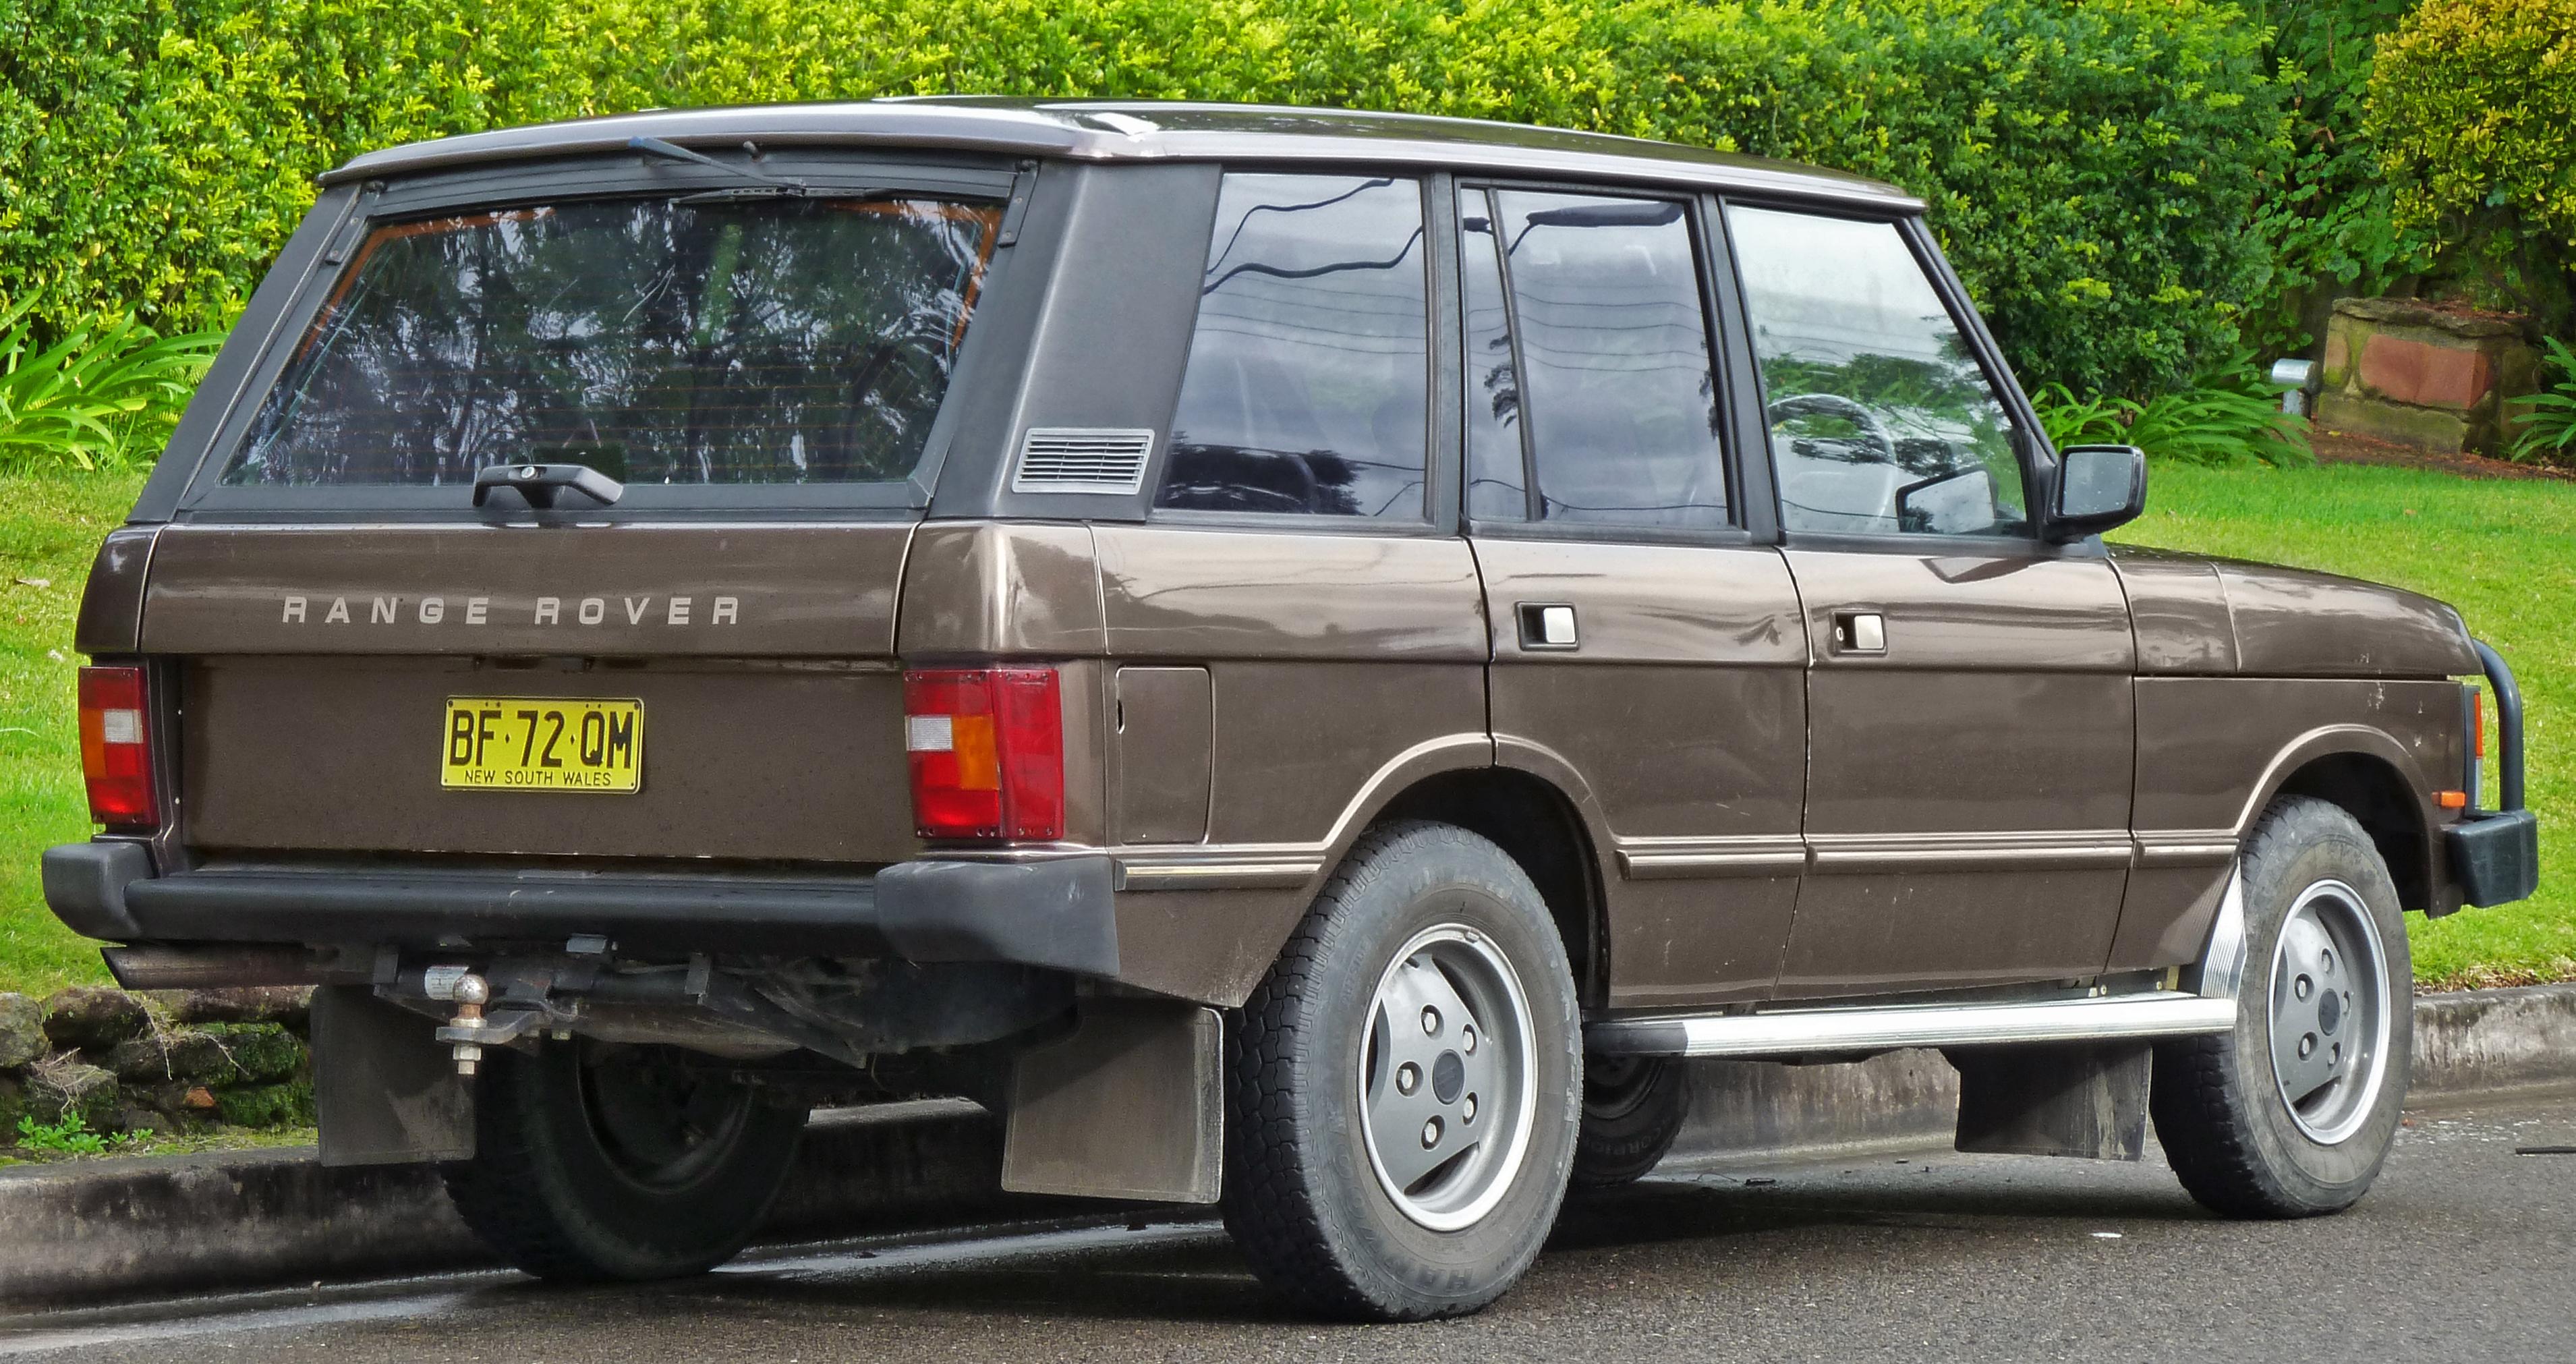 1996 Land Rover Range Rover #4 Land Rover Range Rover #4